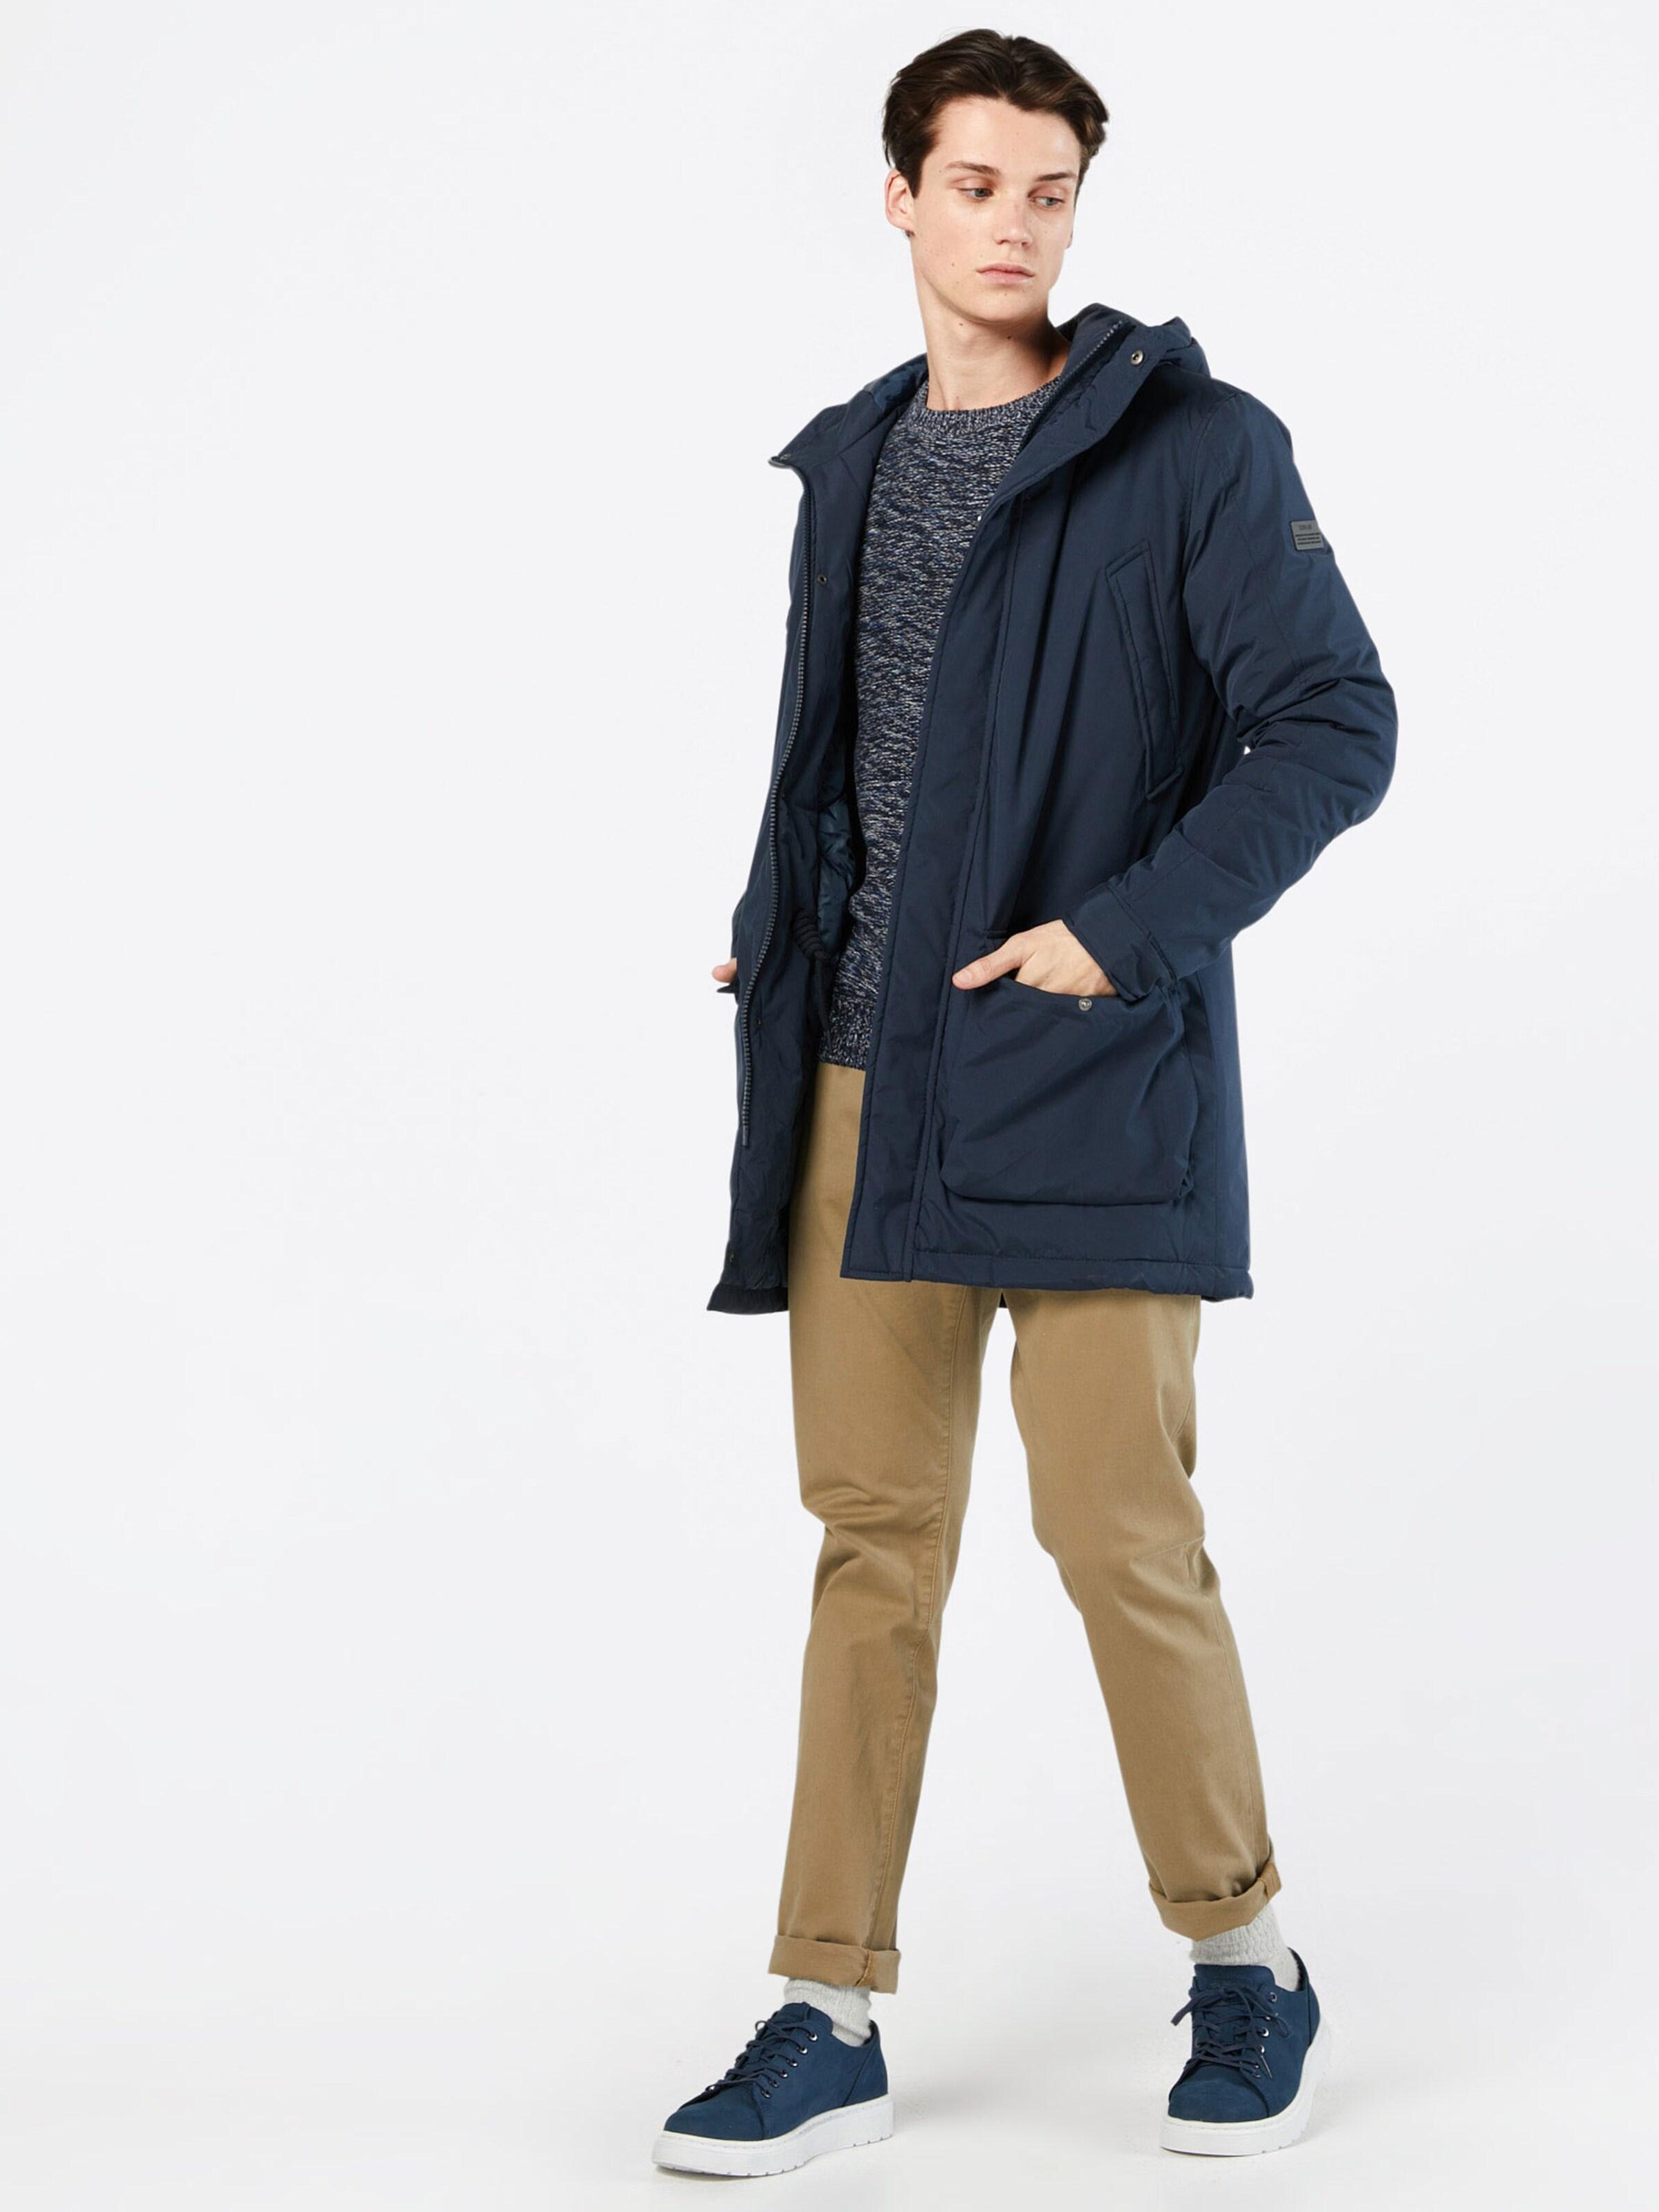 !Solid Winterjacke 'Kelbey' Günstig Kaufen Footlocker Bilder Genießen Online-Verkauf y1OYOKJ3CA